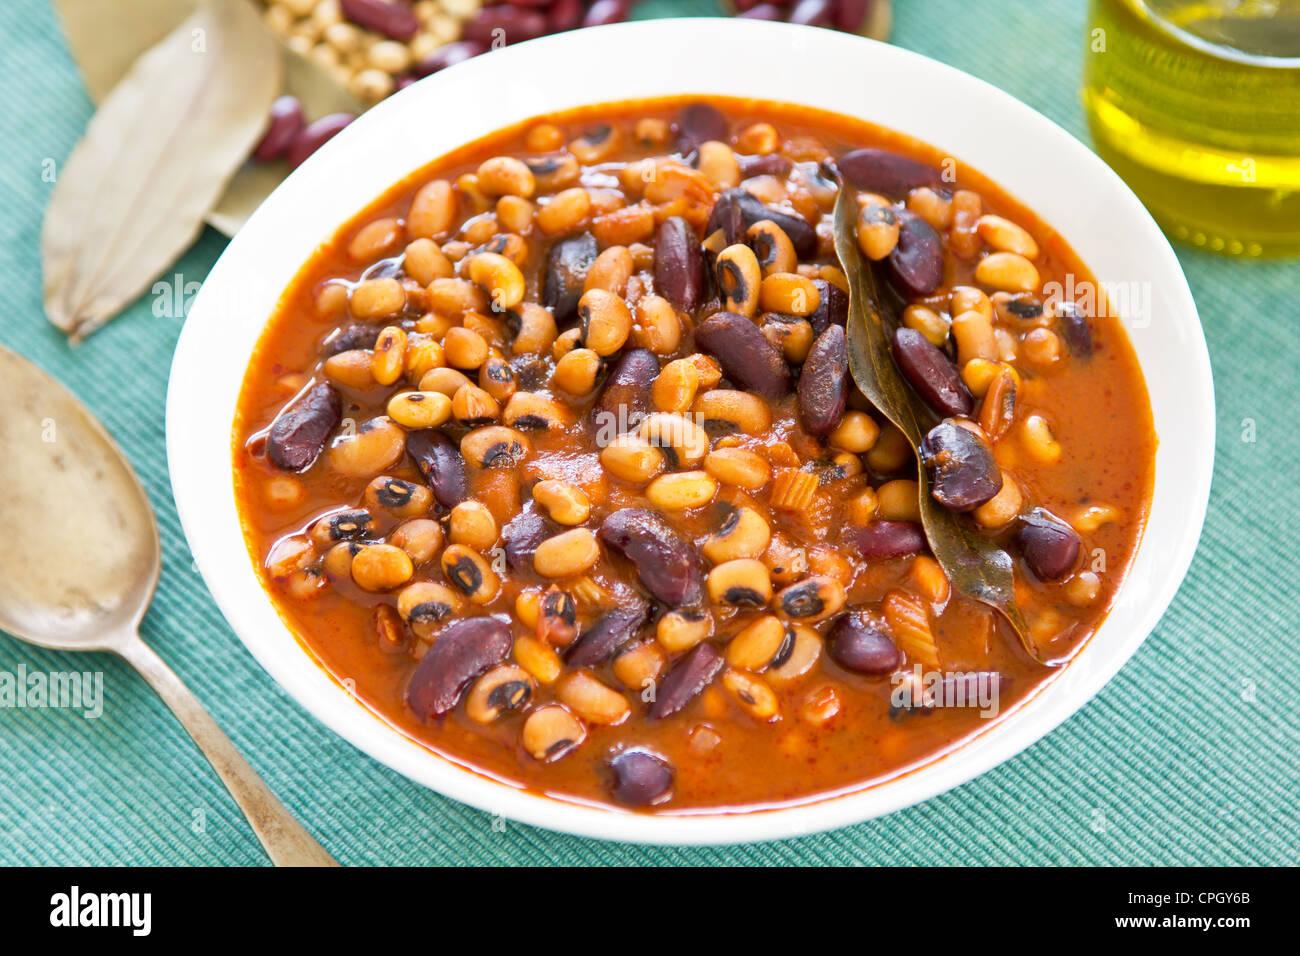 Bean stew - Stock Image